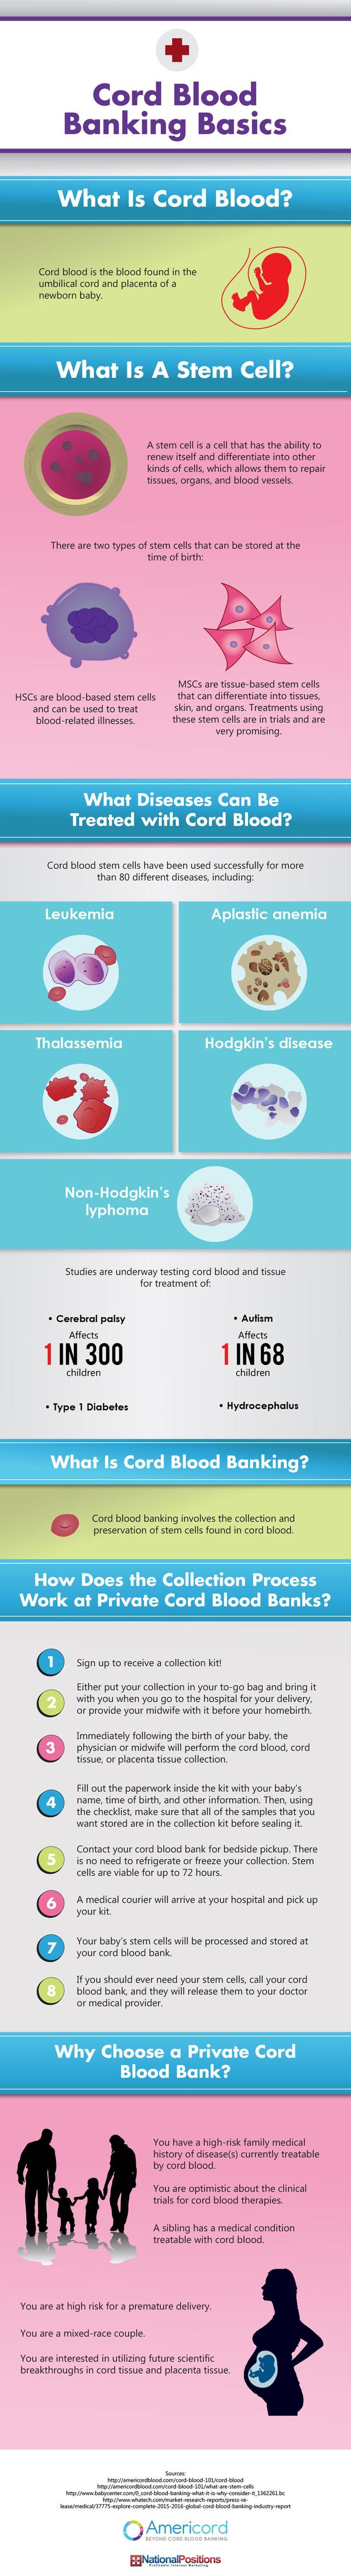 #Infographic: Cord Blood Banking Basics #GCBC